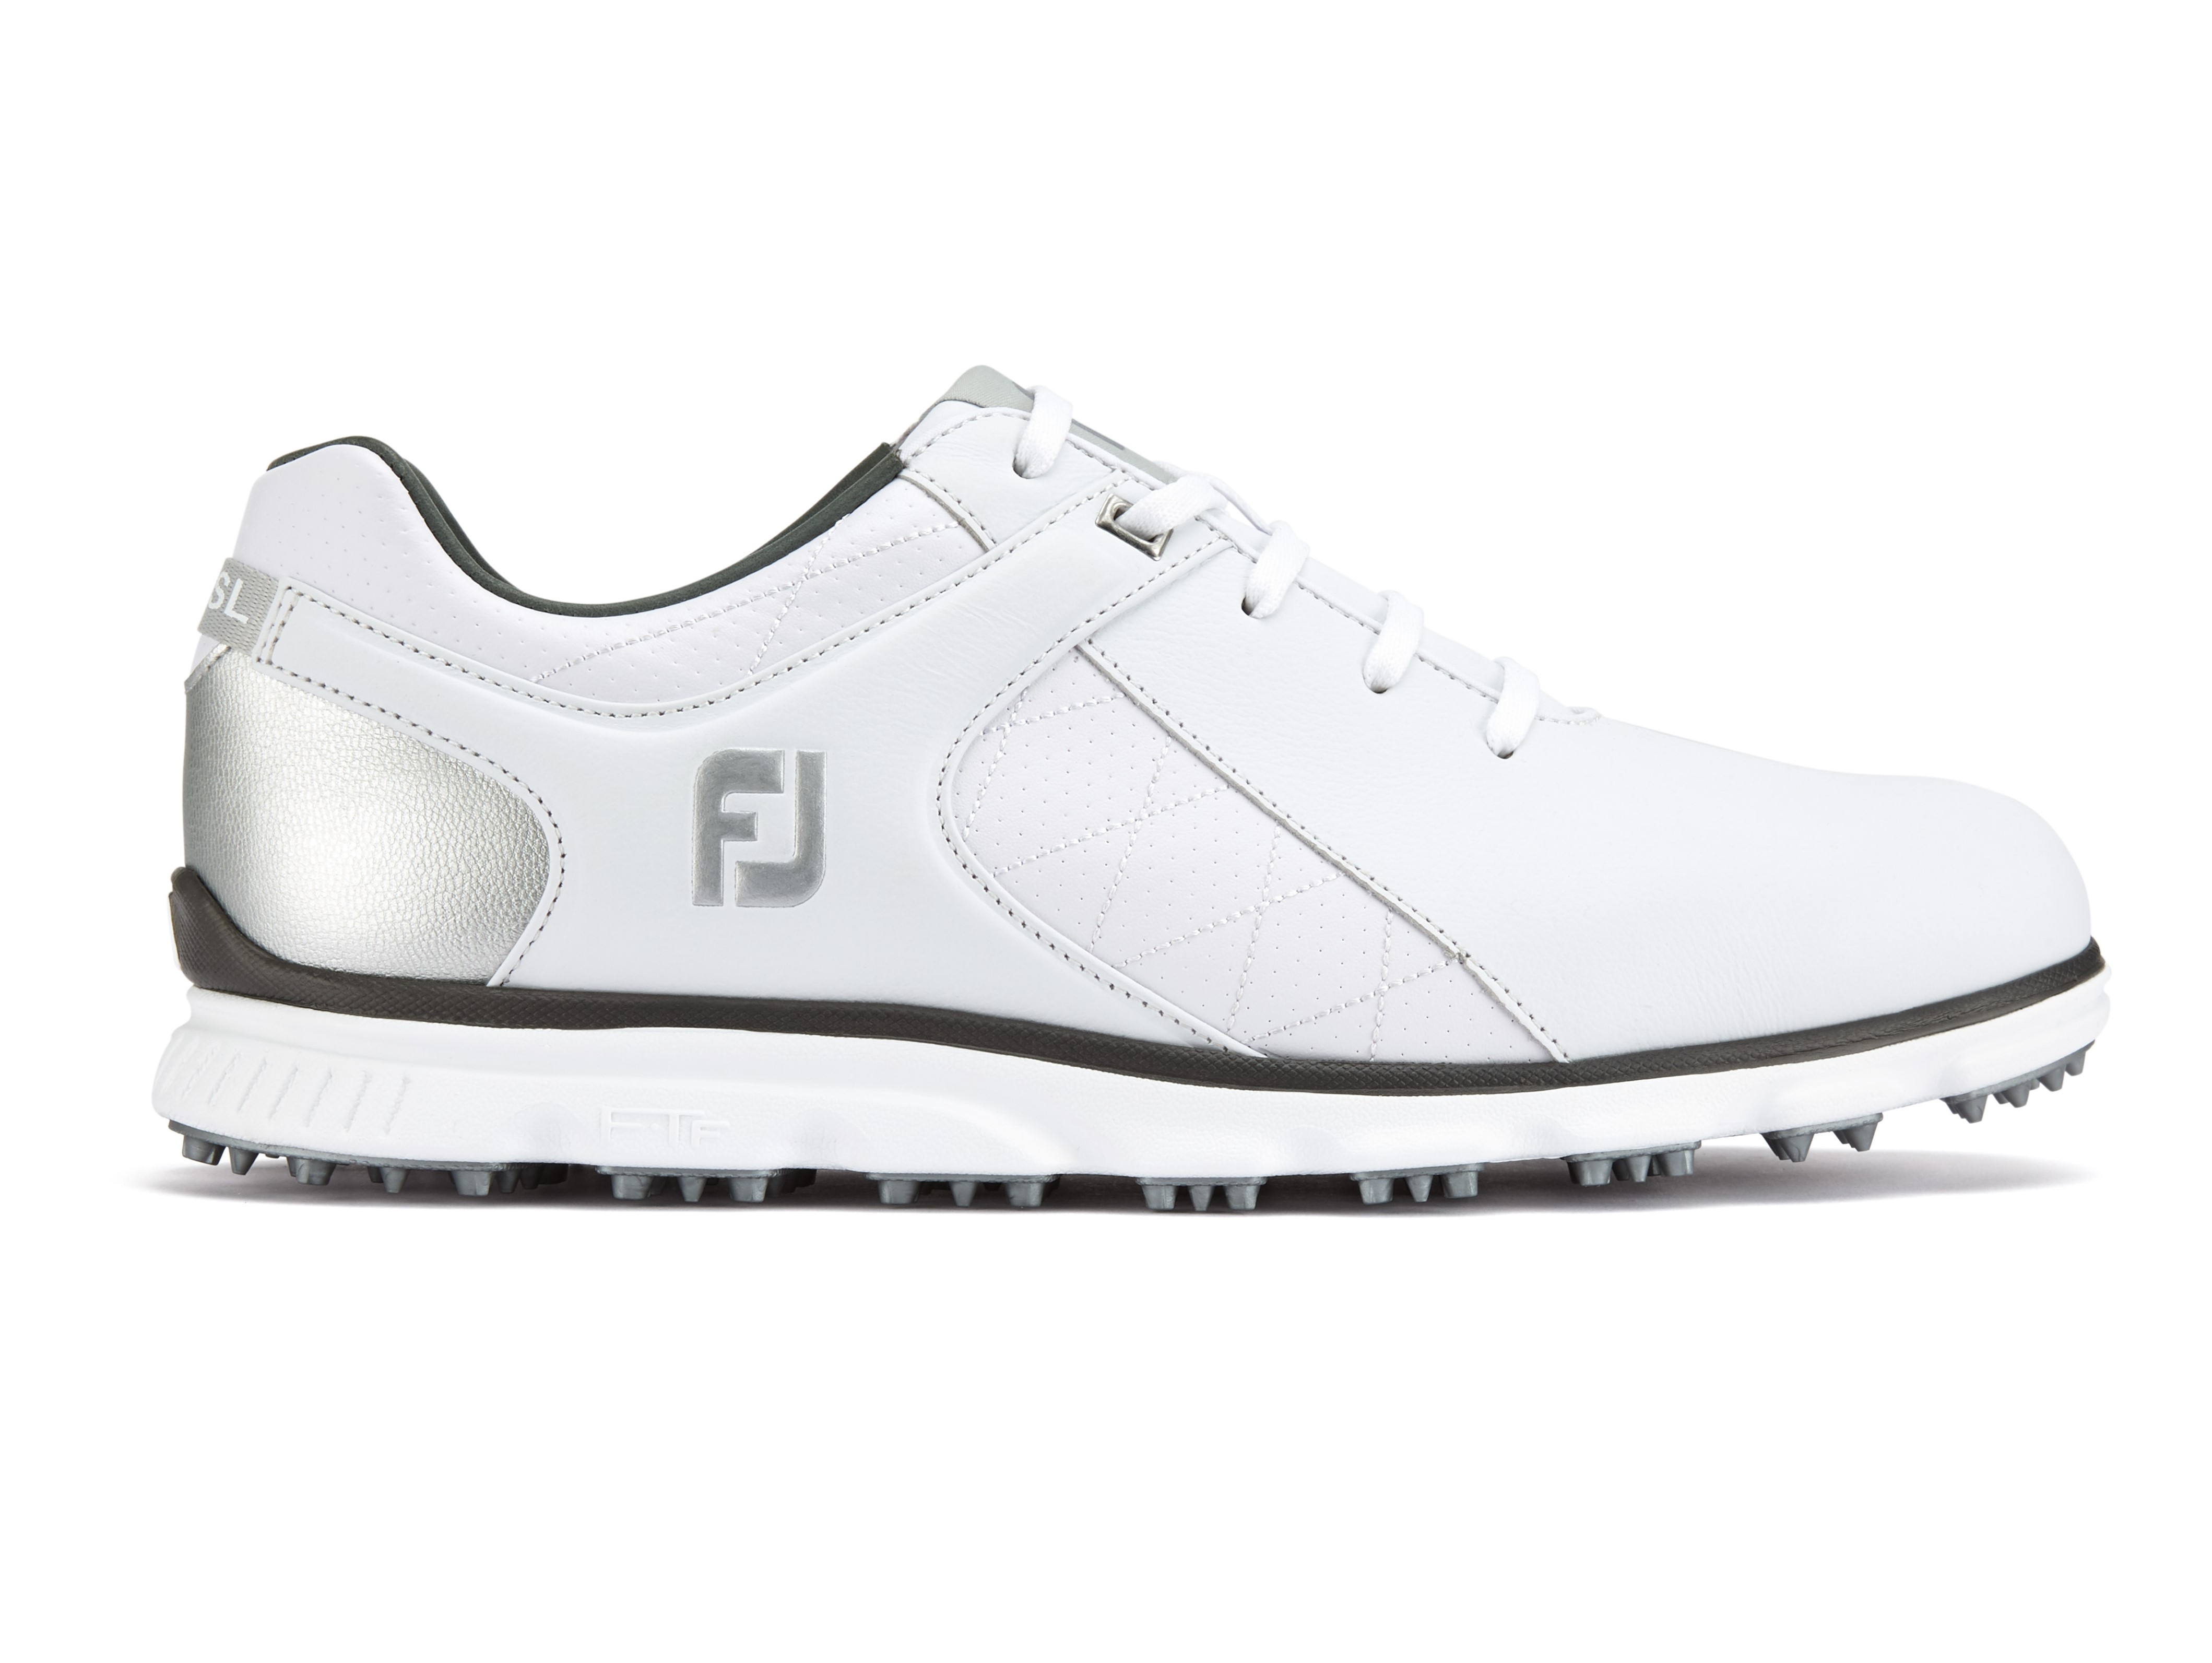 golfmagic reader day footjoy pro s/l testing